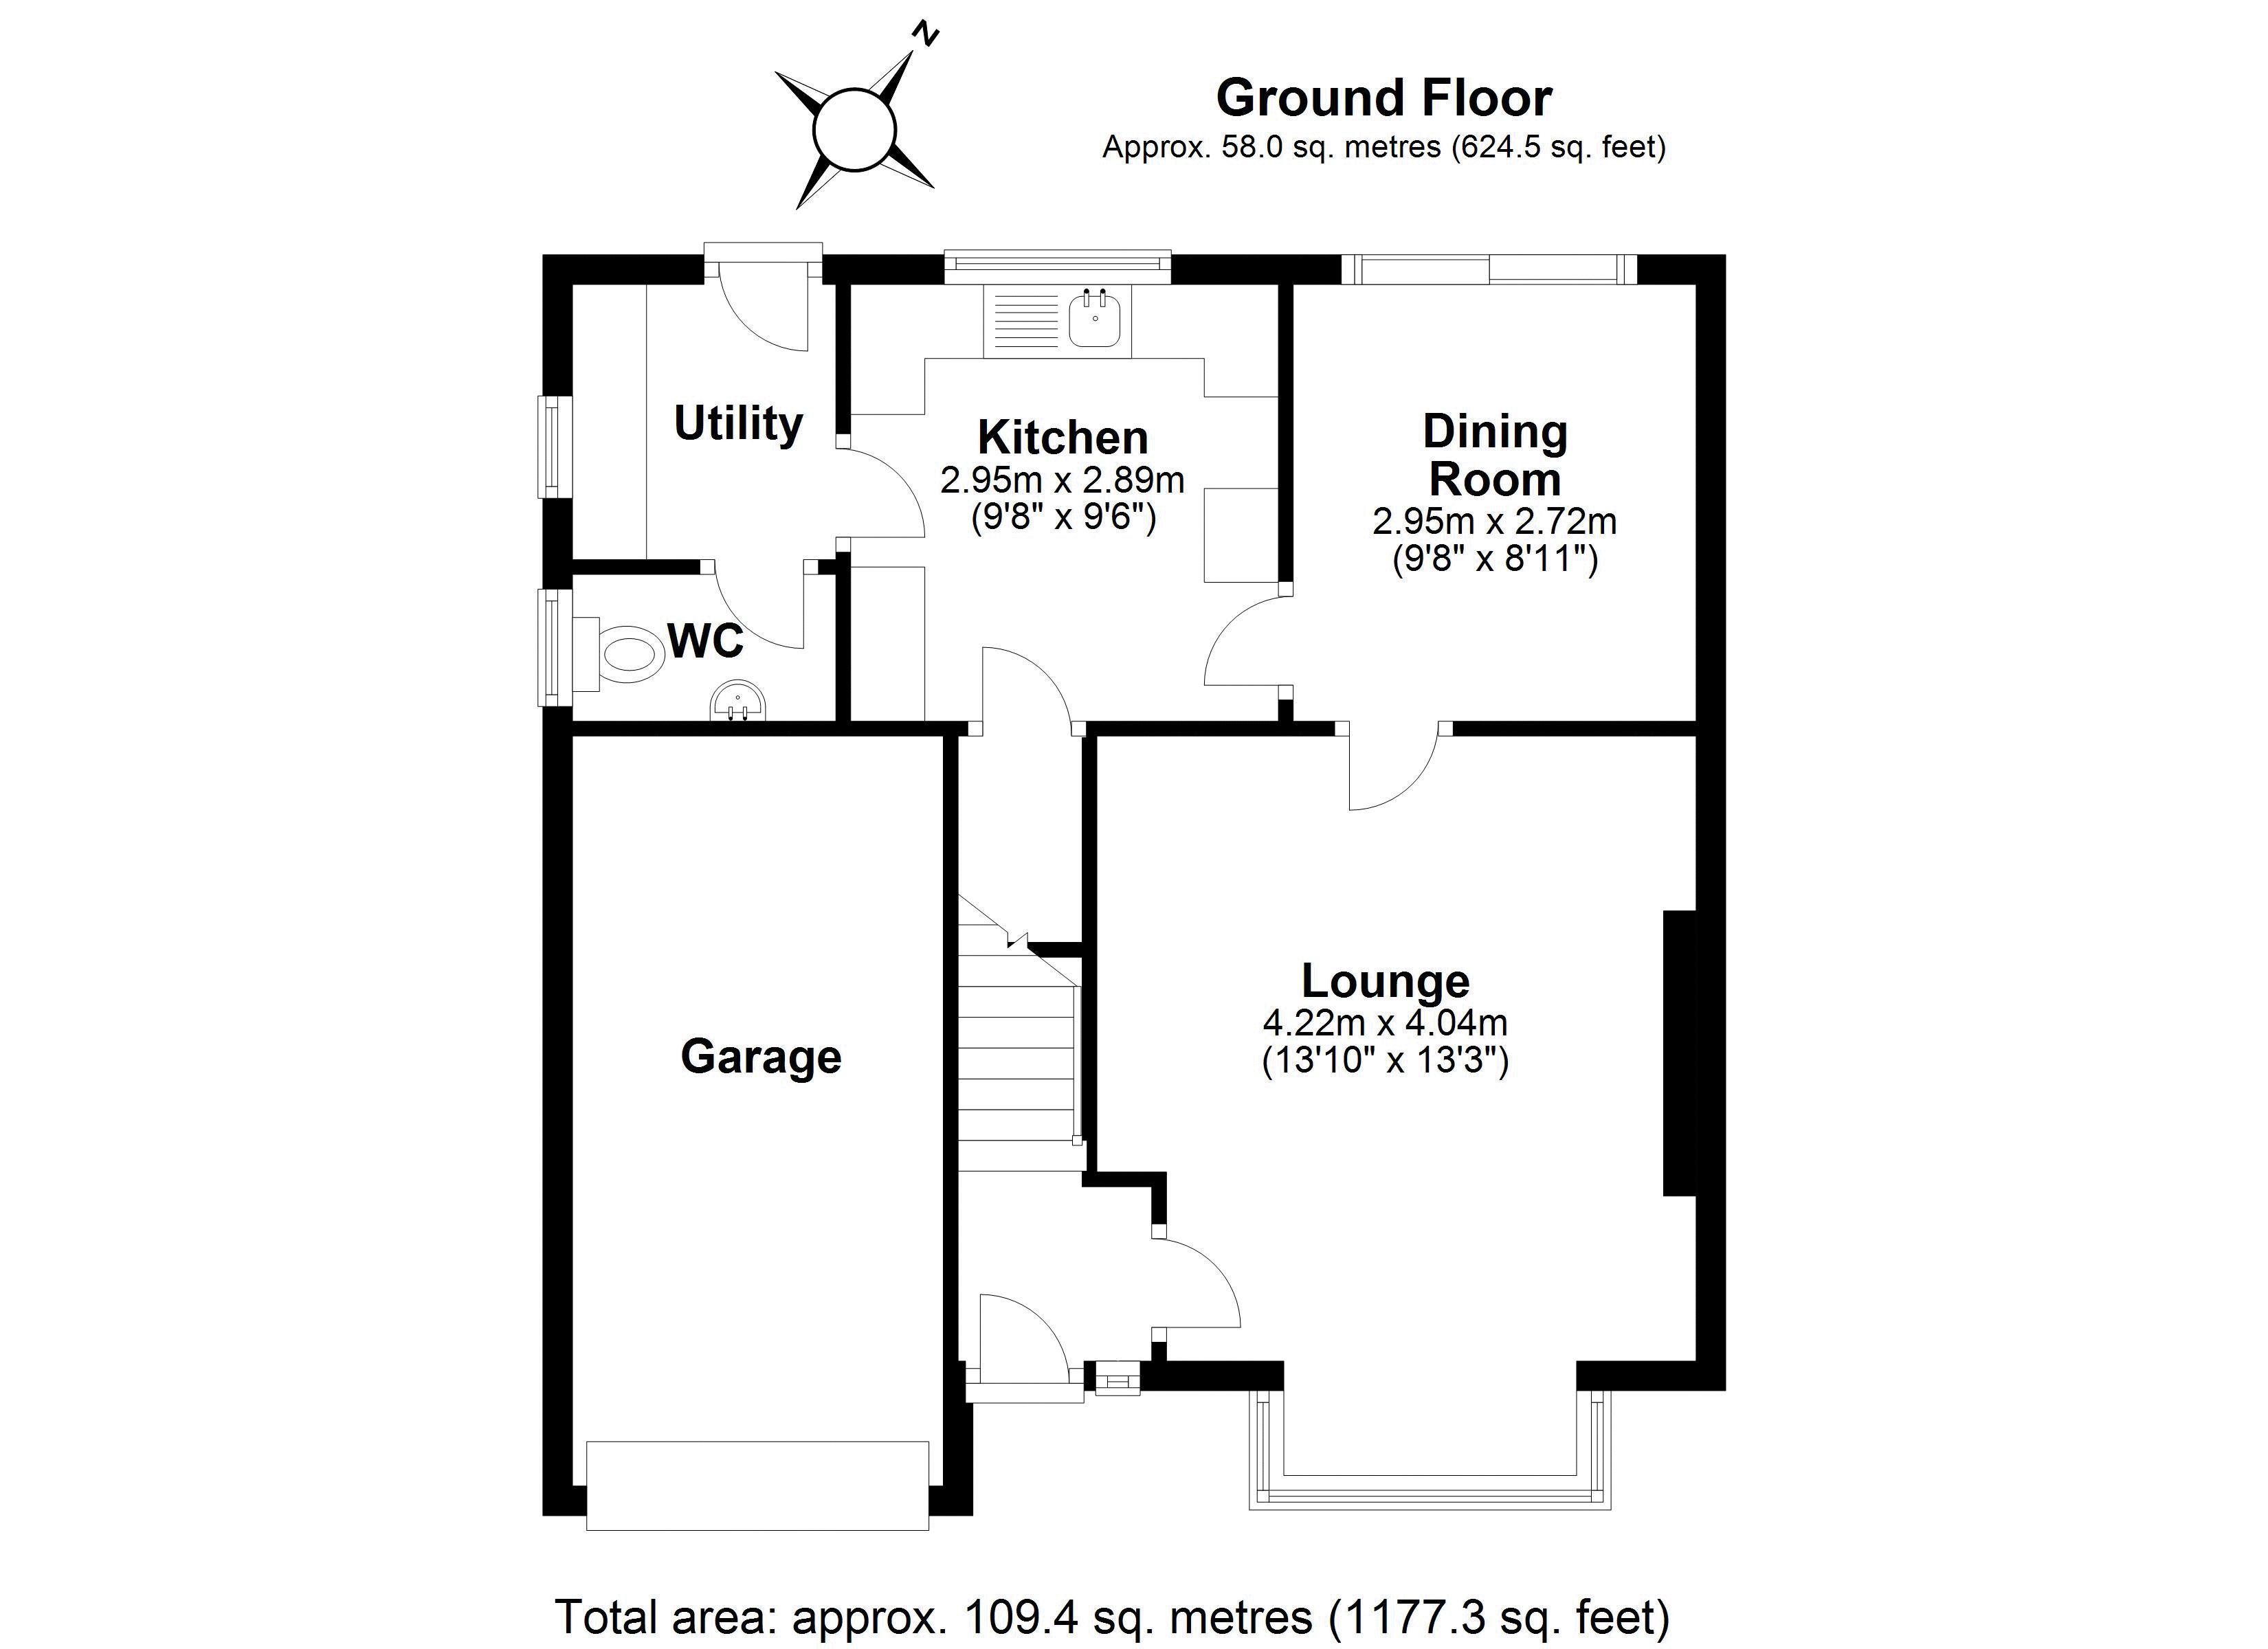 KIngfisher Ground floor plan